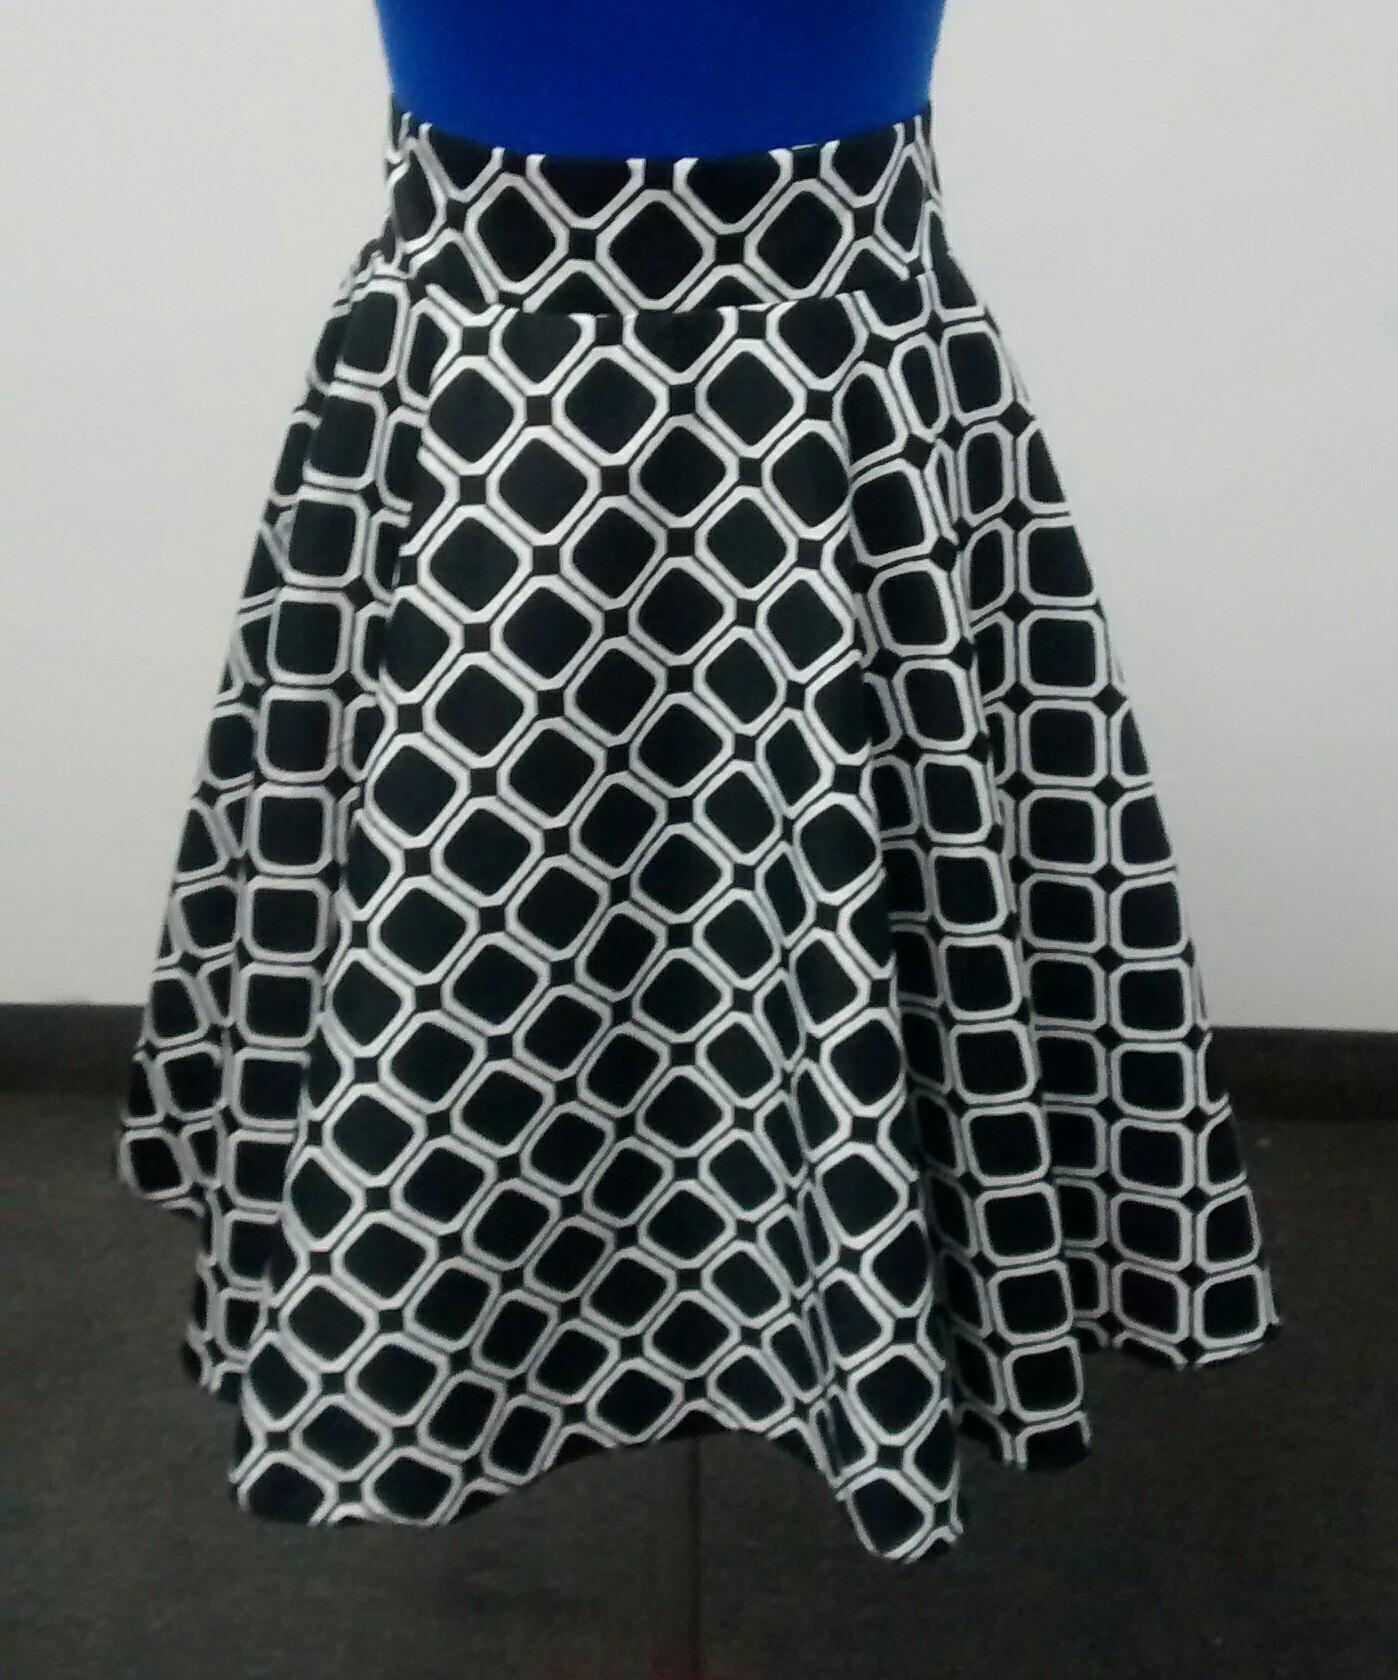 Half circle skirt (1/2)